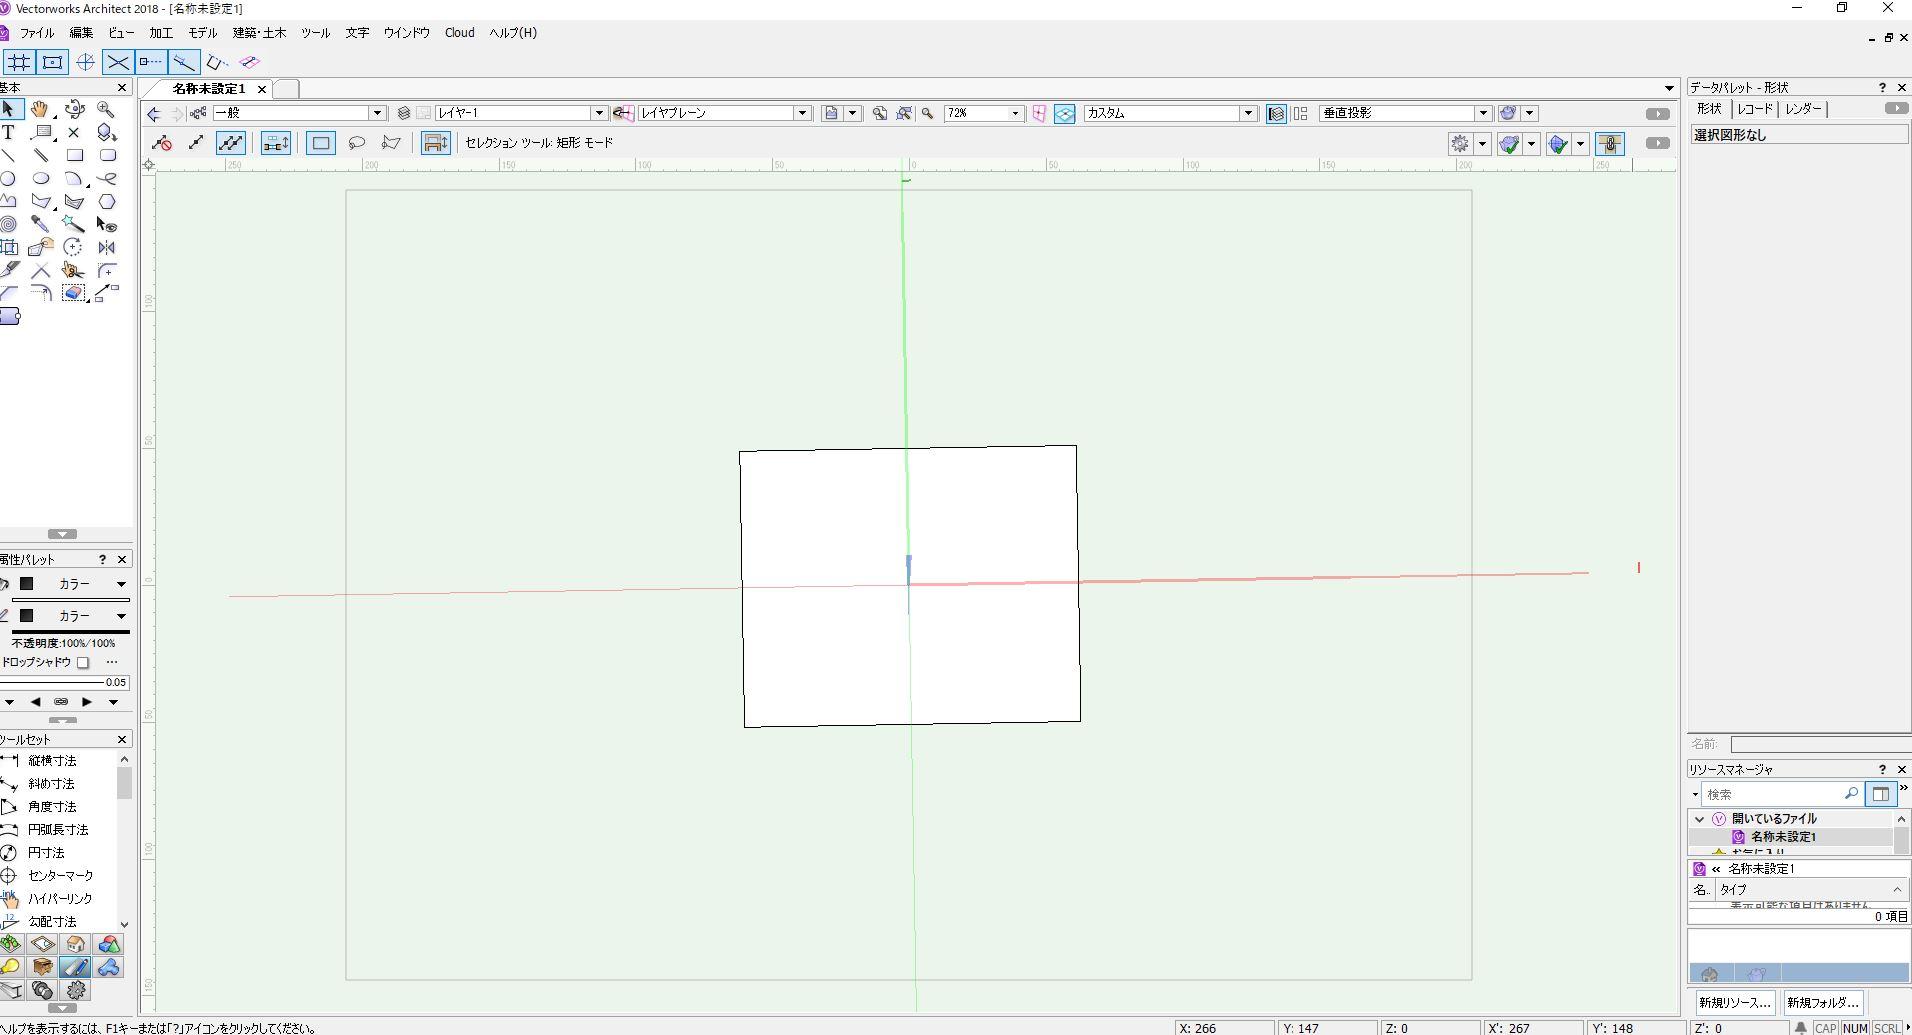 Vectorworksが突然3D画面になって困った時に2D画面に戻す方法